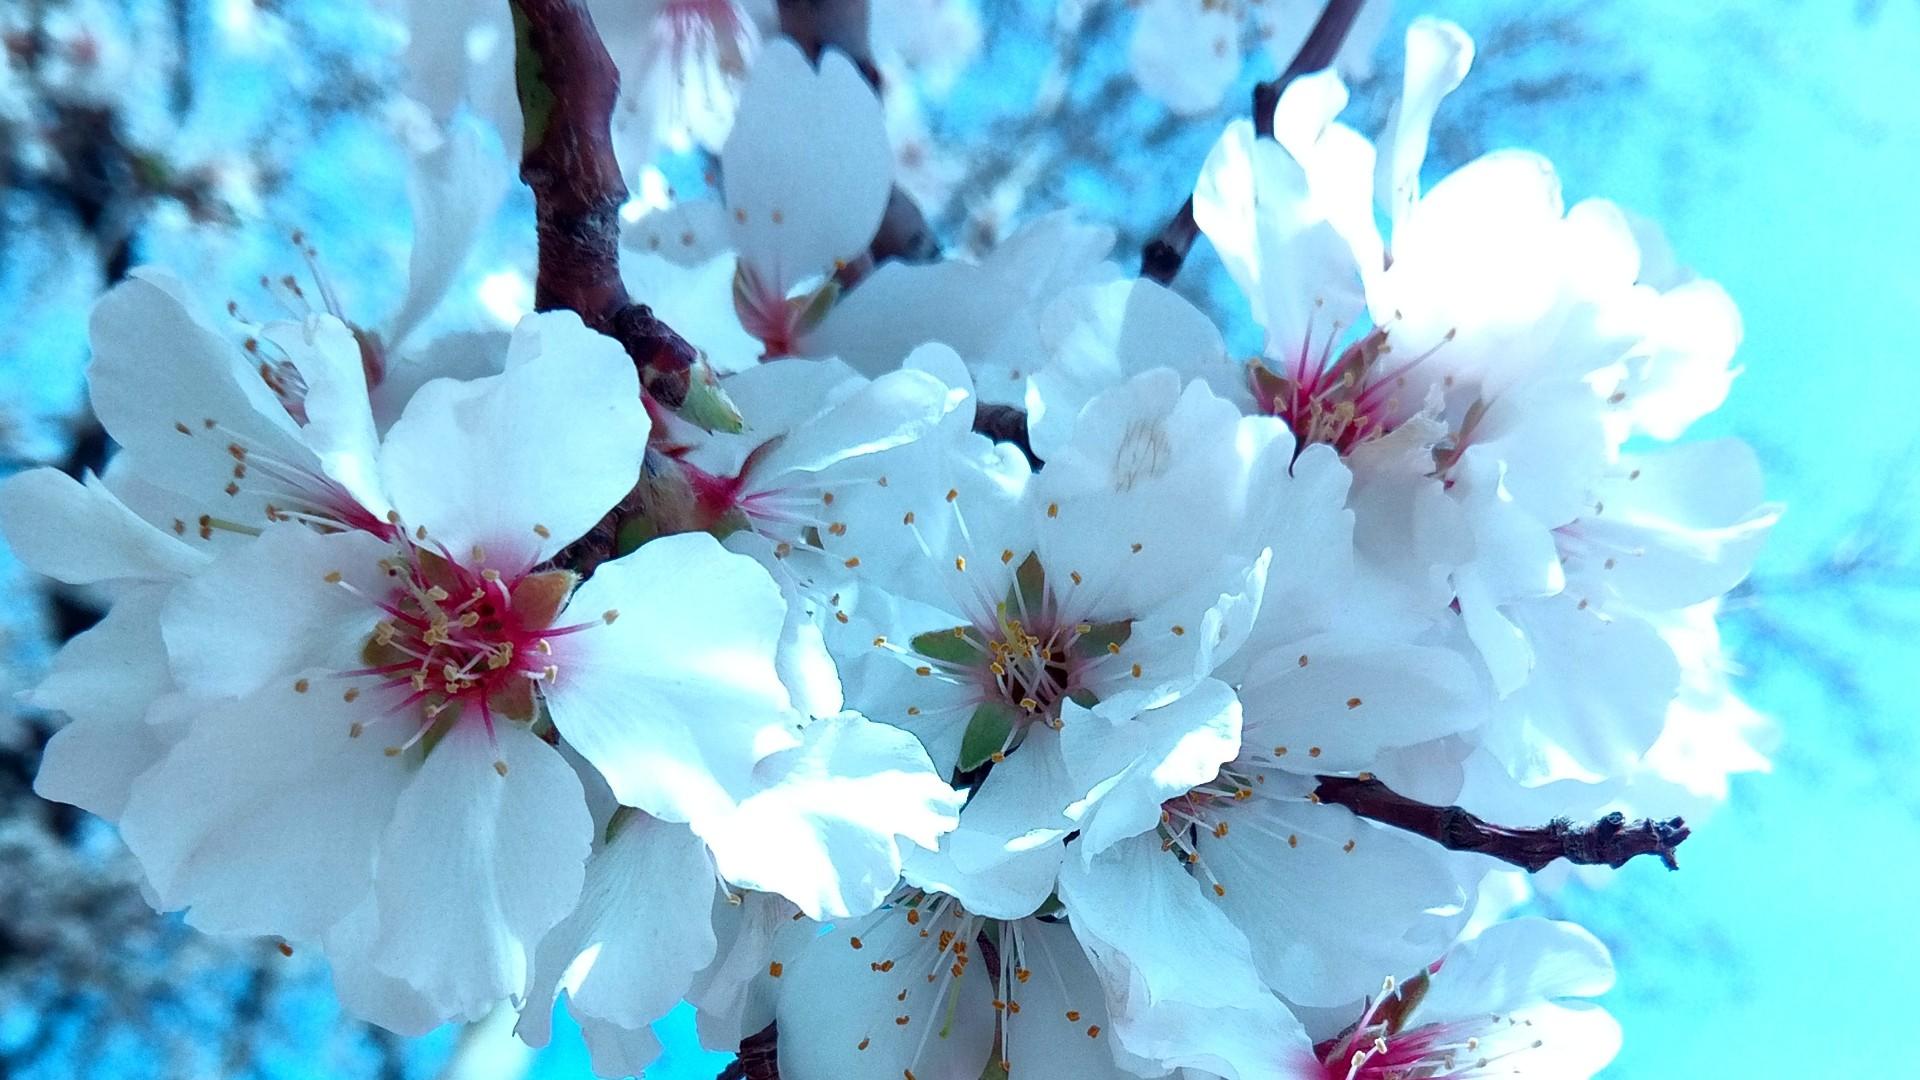 Apricot tree blossom wallpaper